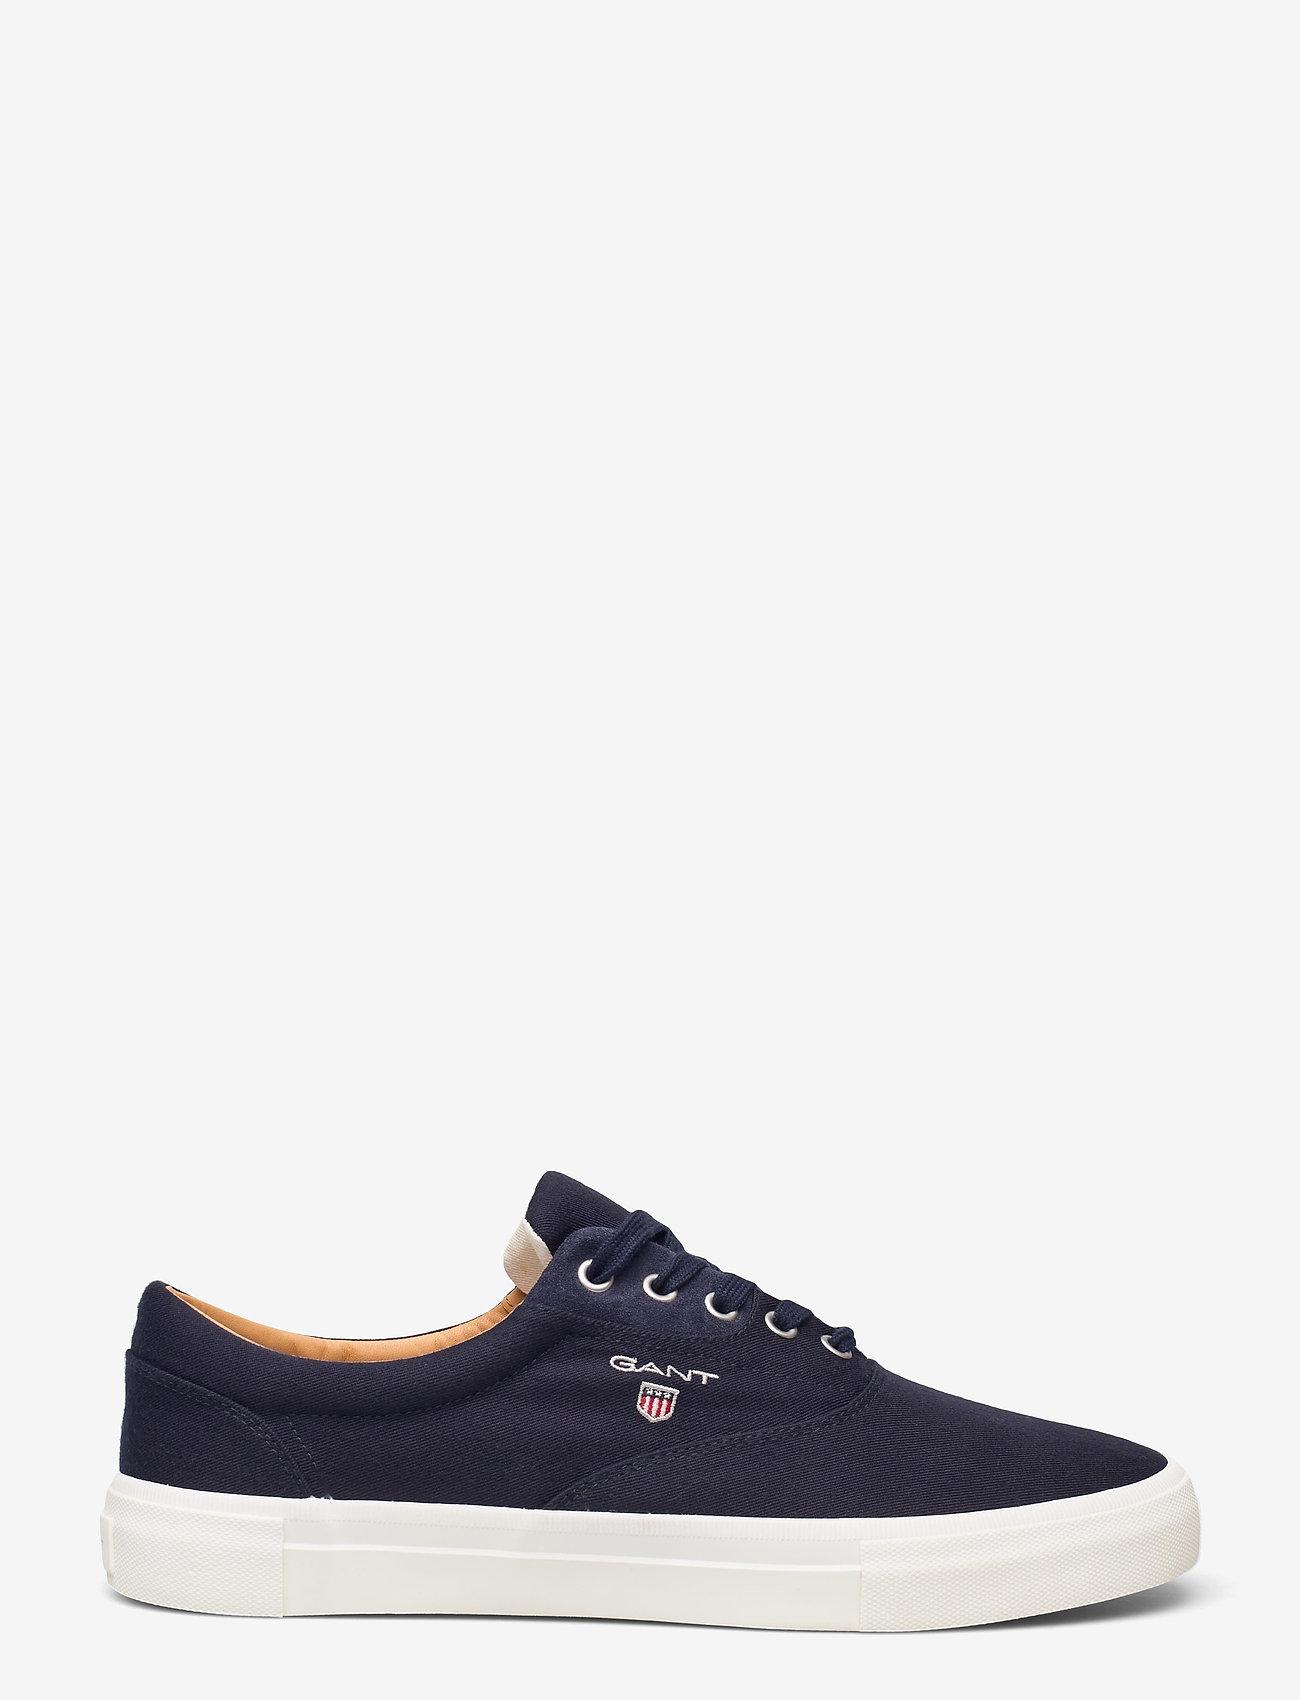 GANT - Sundale Low lace sho - low tops - marine - 1